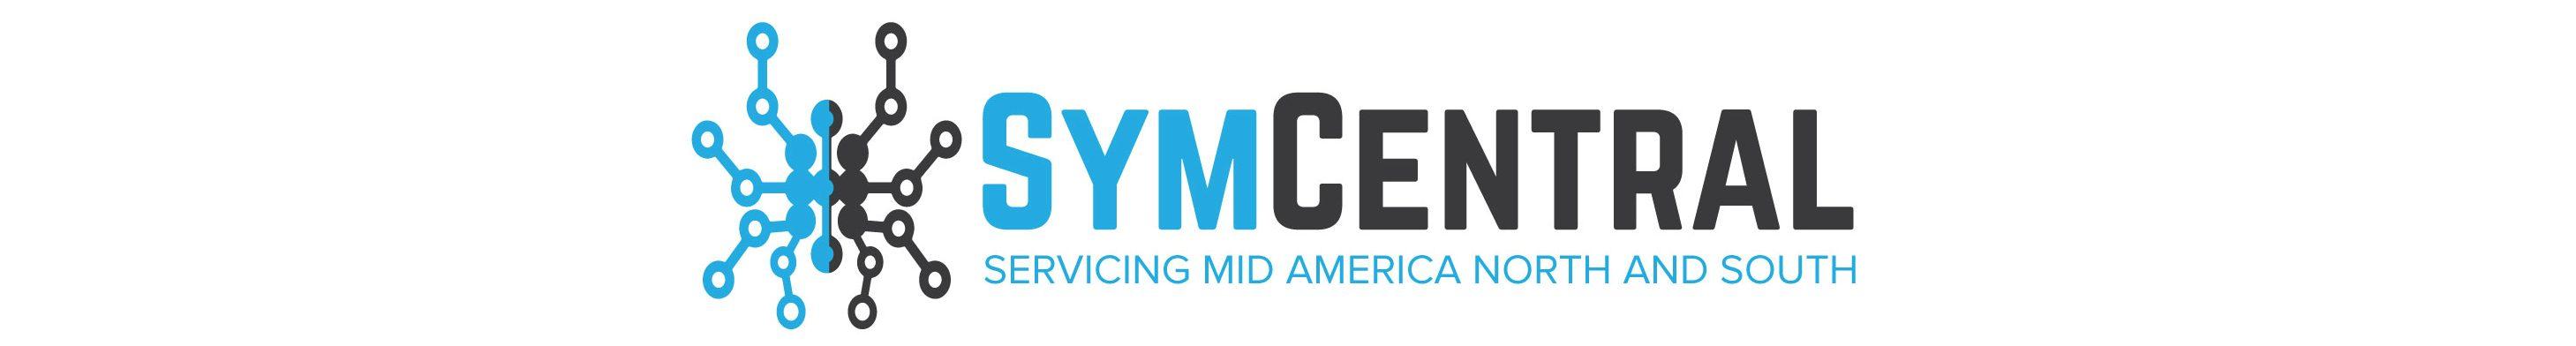 SymCentral